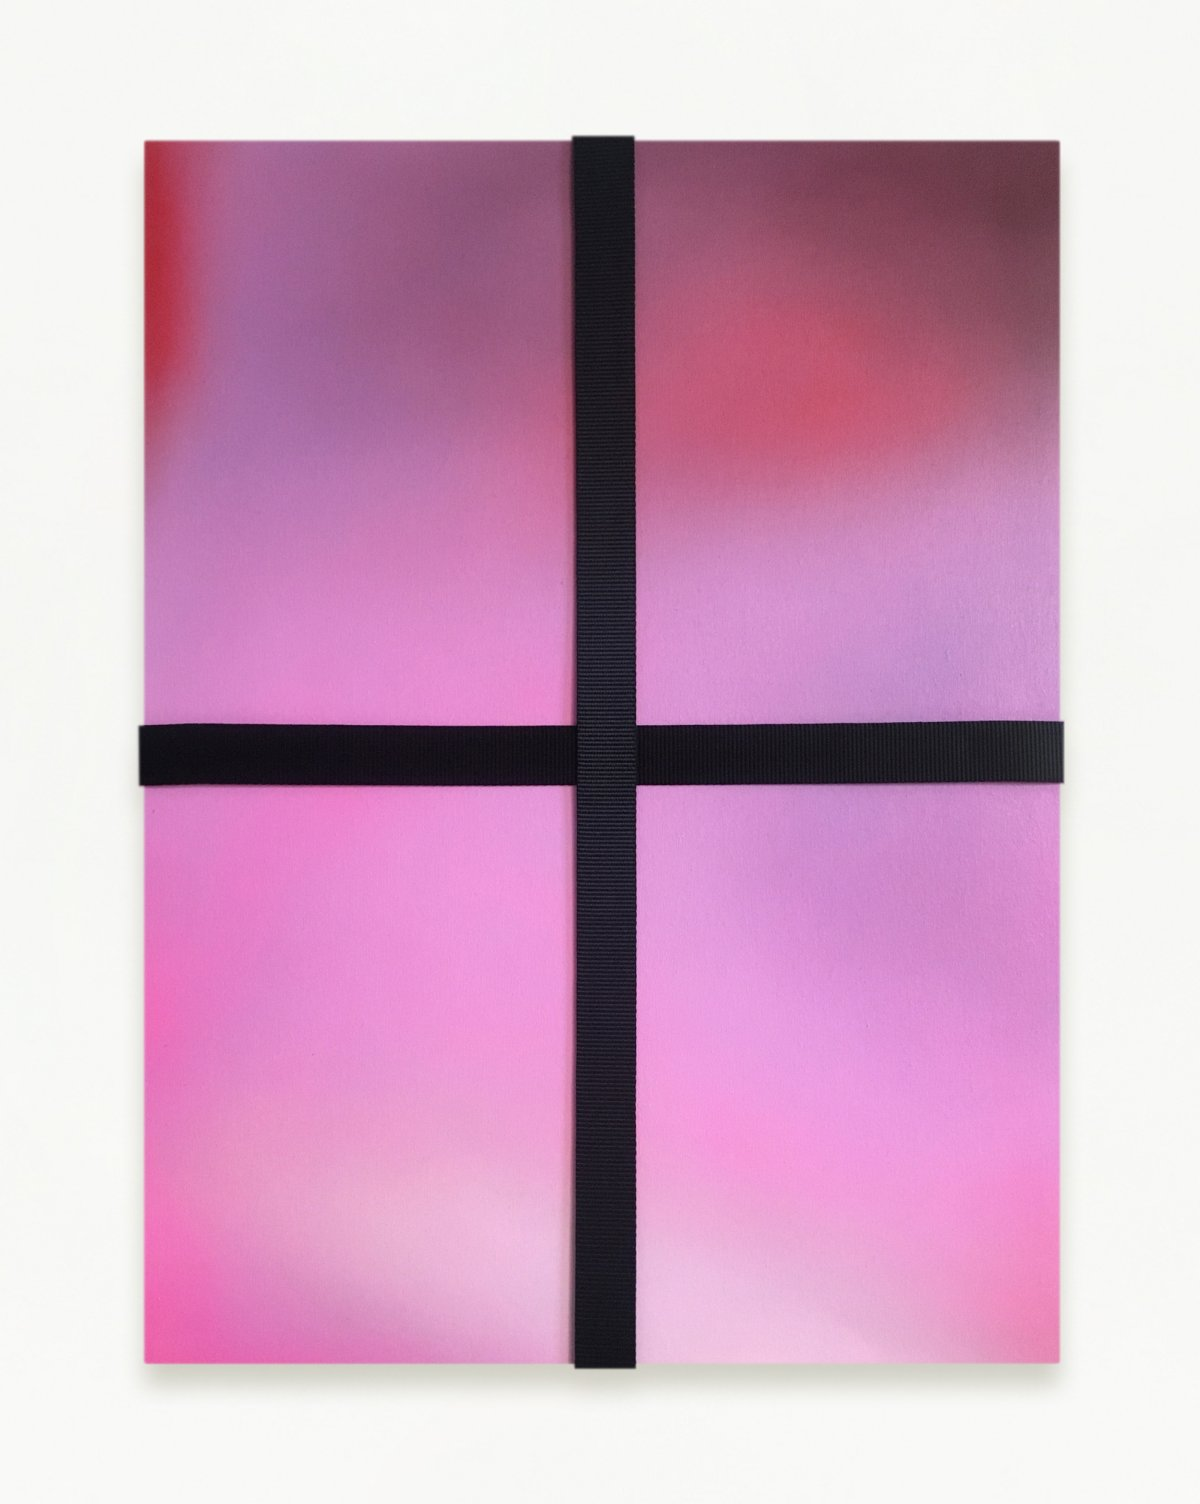 Windows 2020 (pink)